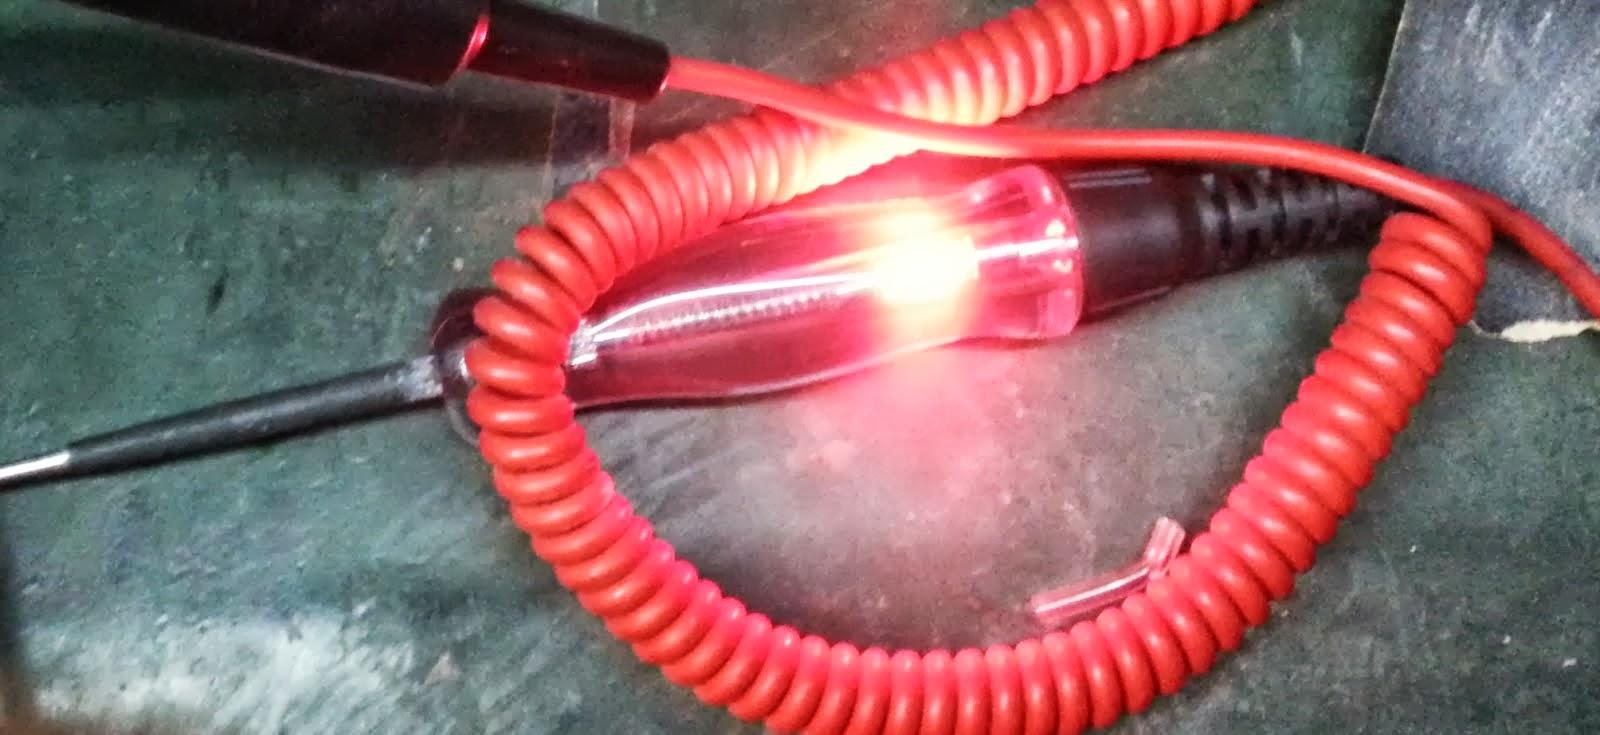 ebay id :fluke l store blog: Matco Tools MD115A Heavy Duty